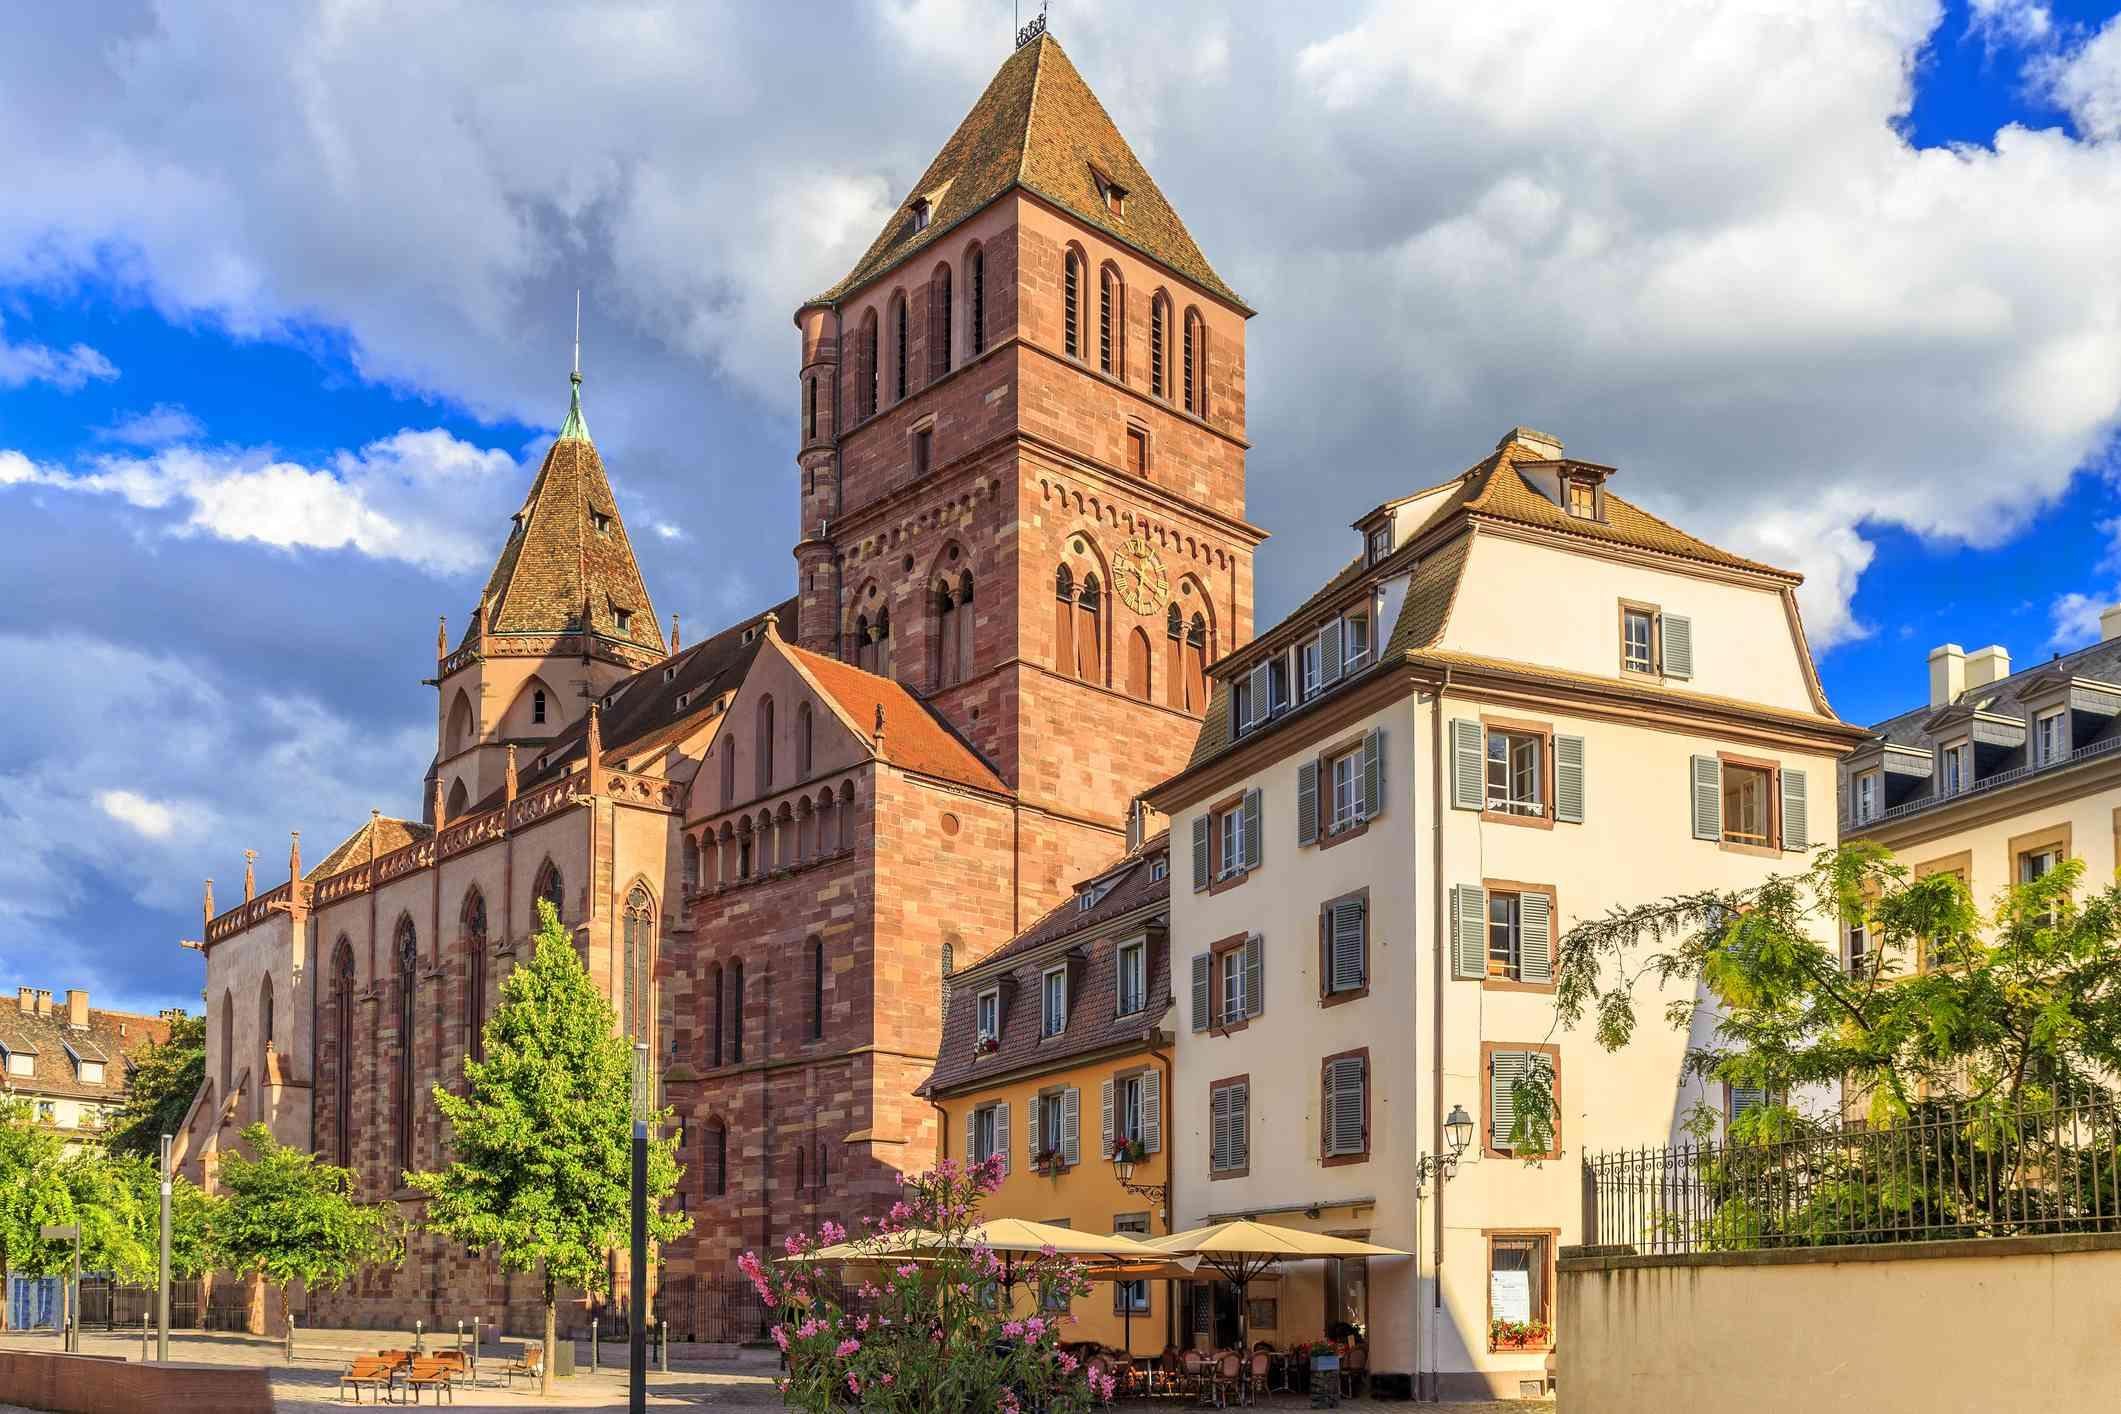 Saint-Thomas Protestant Church in Strasbourg, France